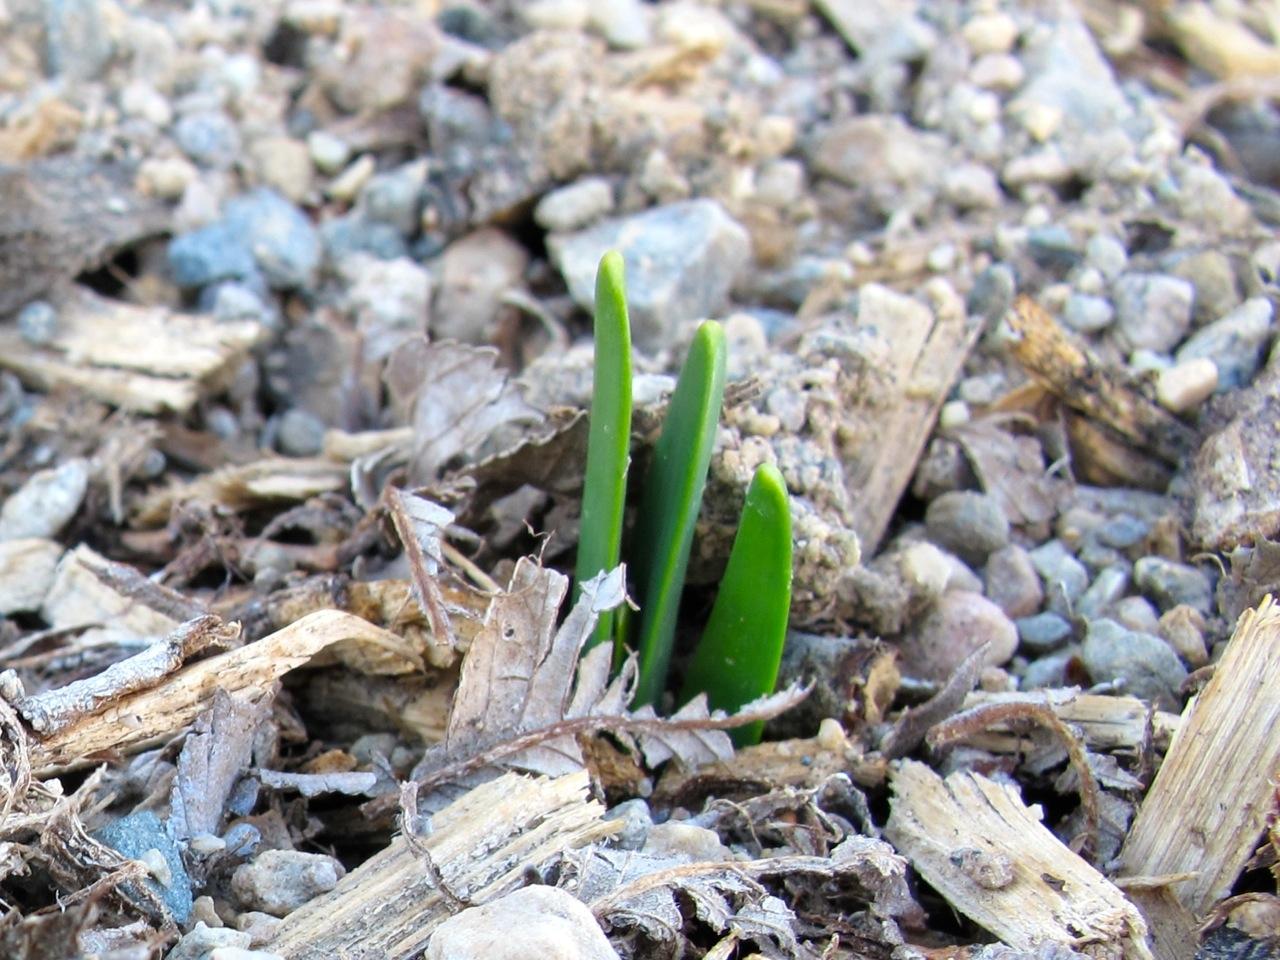 Daffodil leaves poking through the mulch.